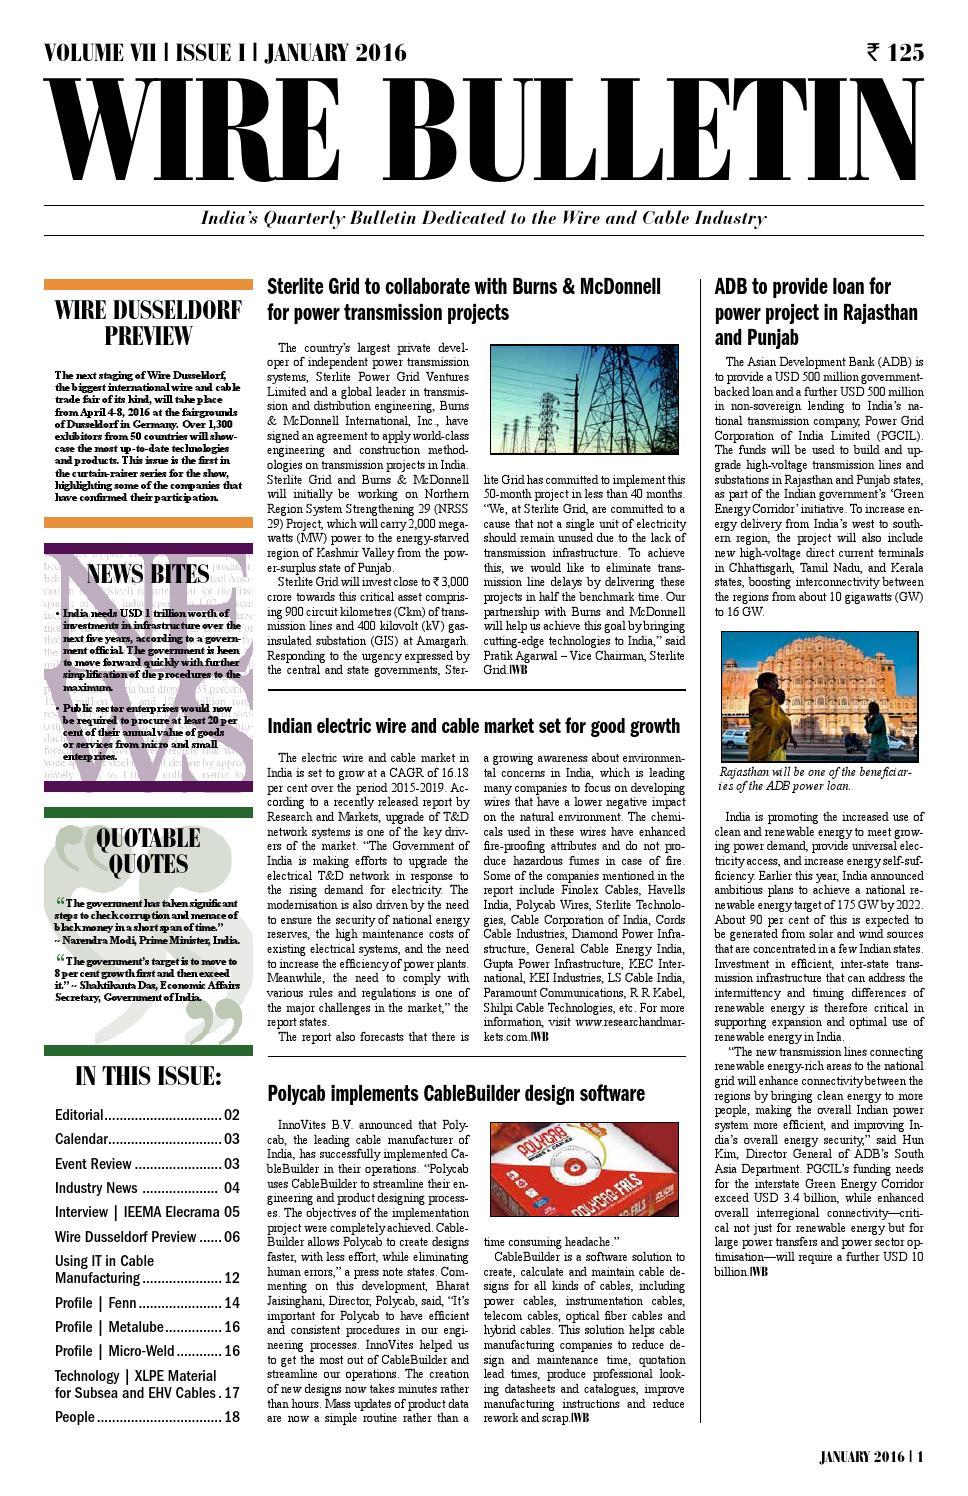 Wire Bulletin - January 2016 by Wire Journal International, Inc. - issuu